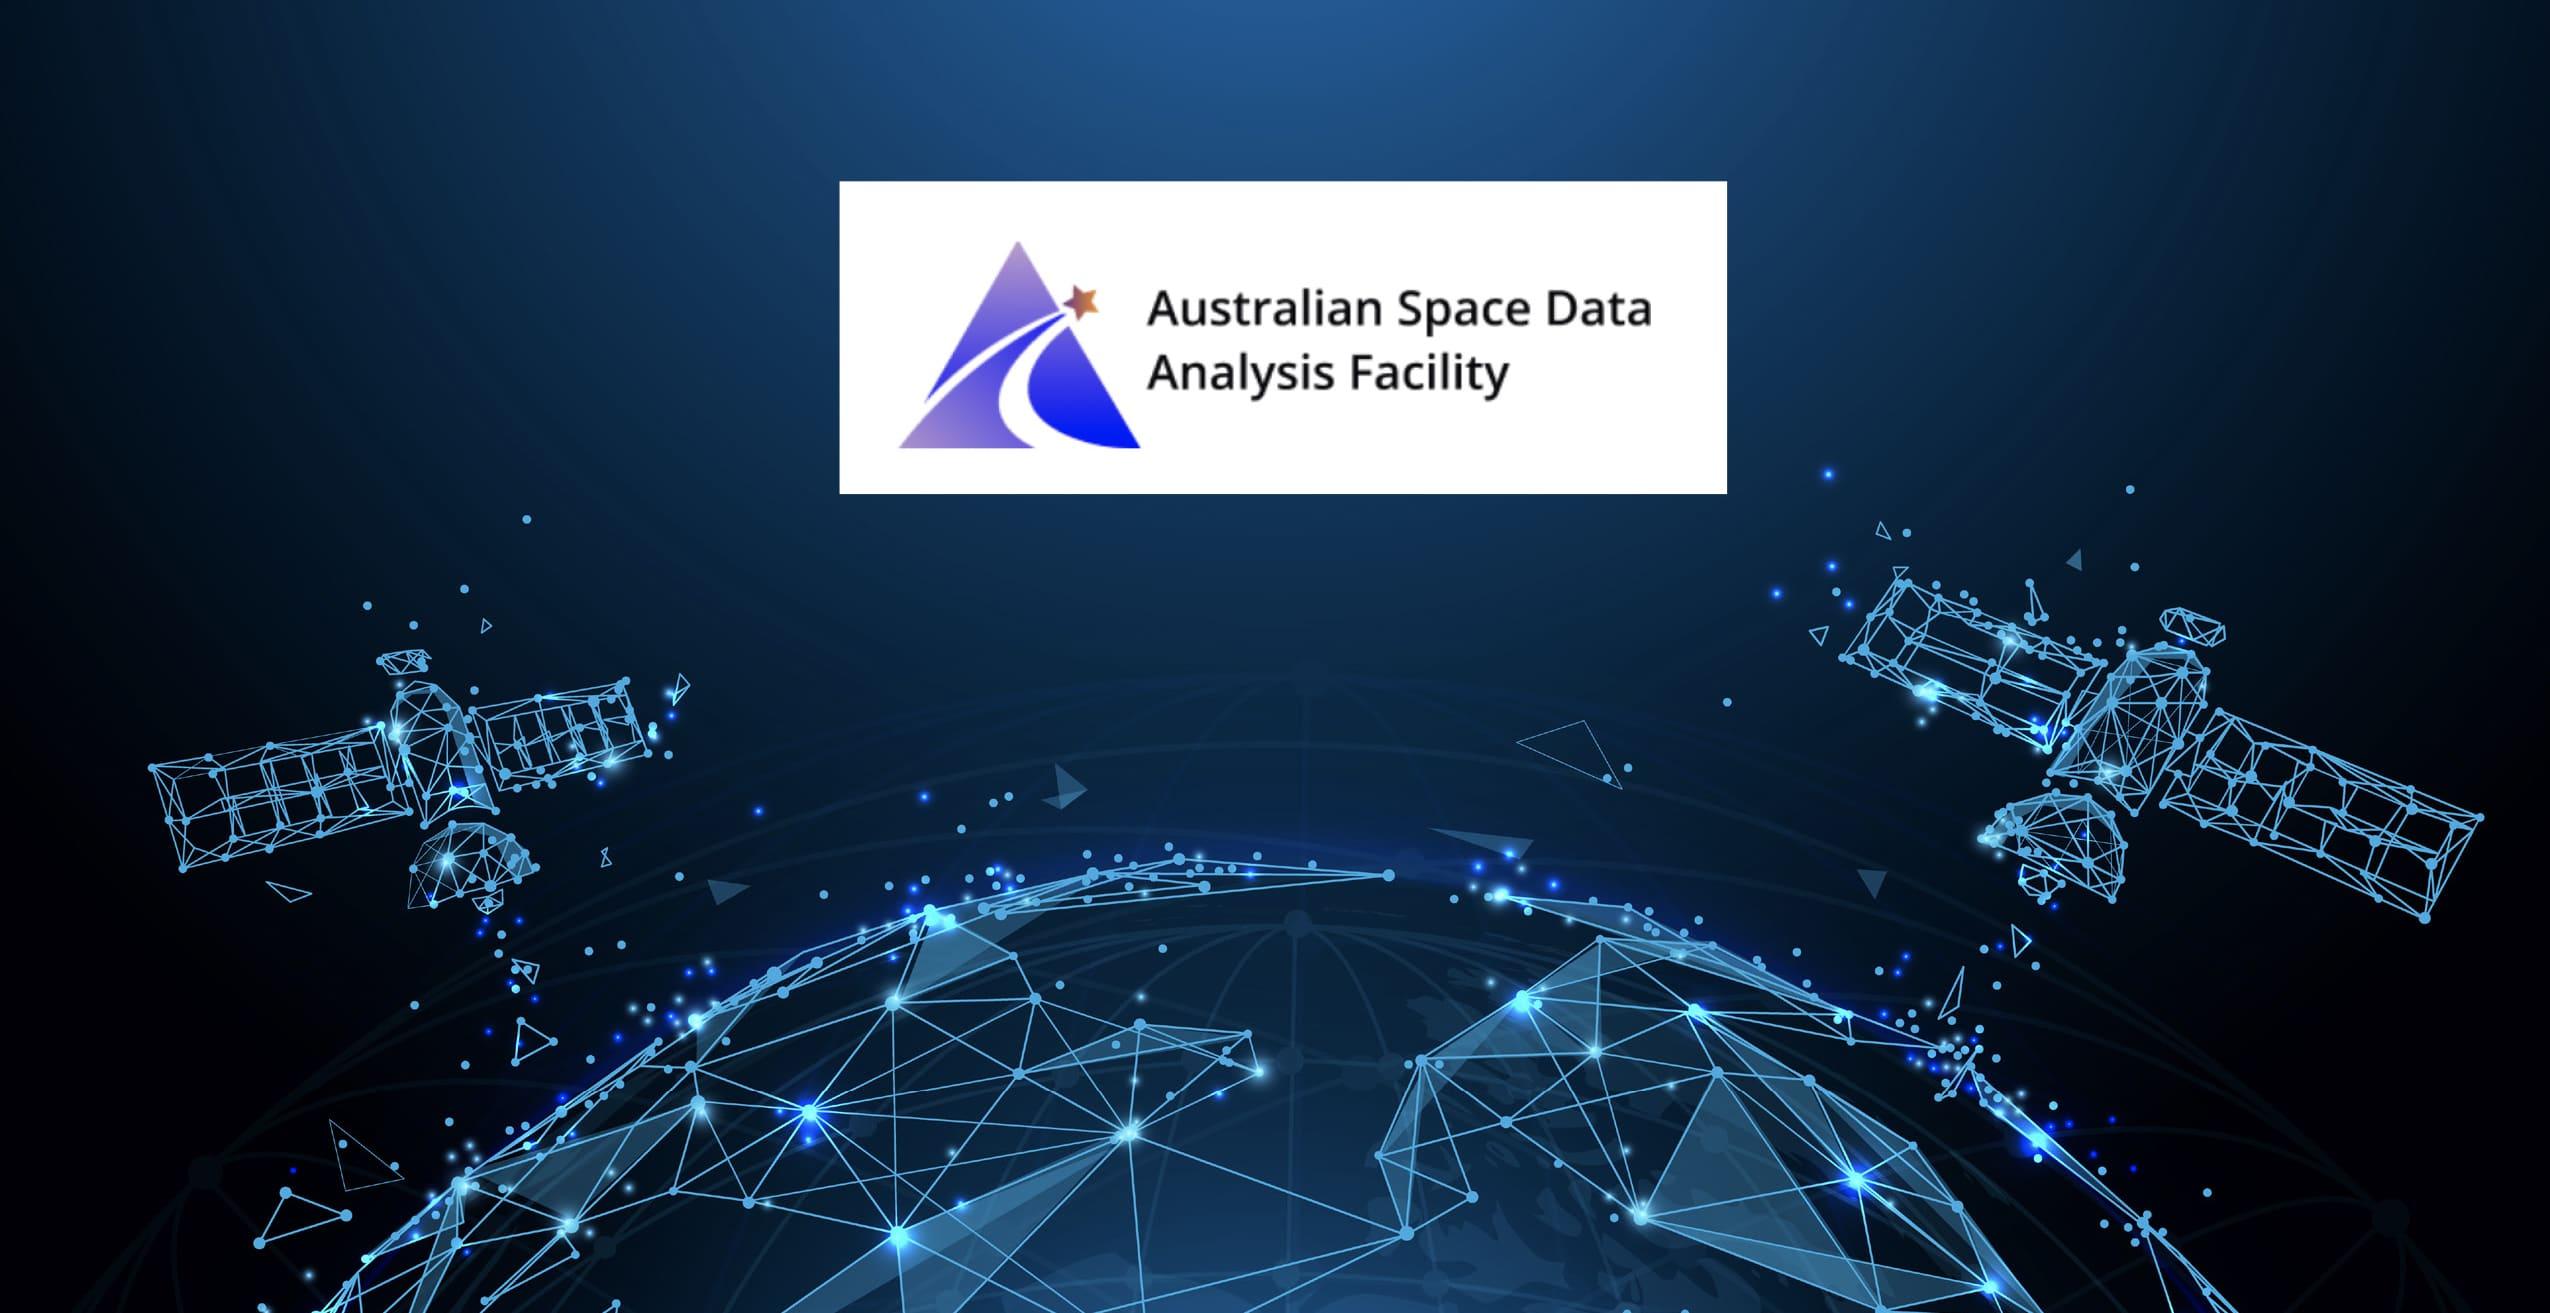 Australian Space Data Analysis Facility